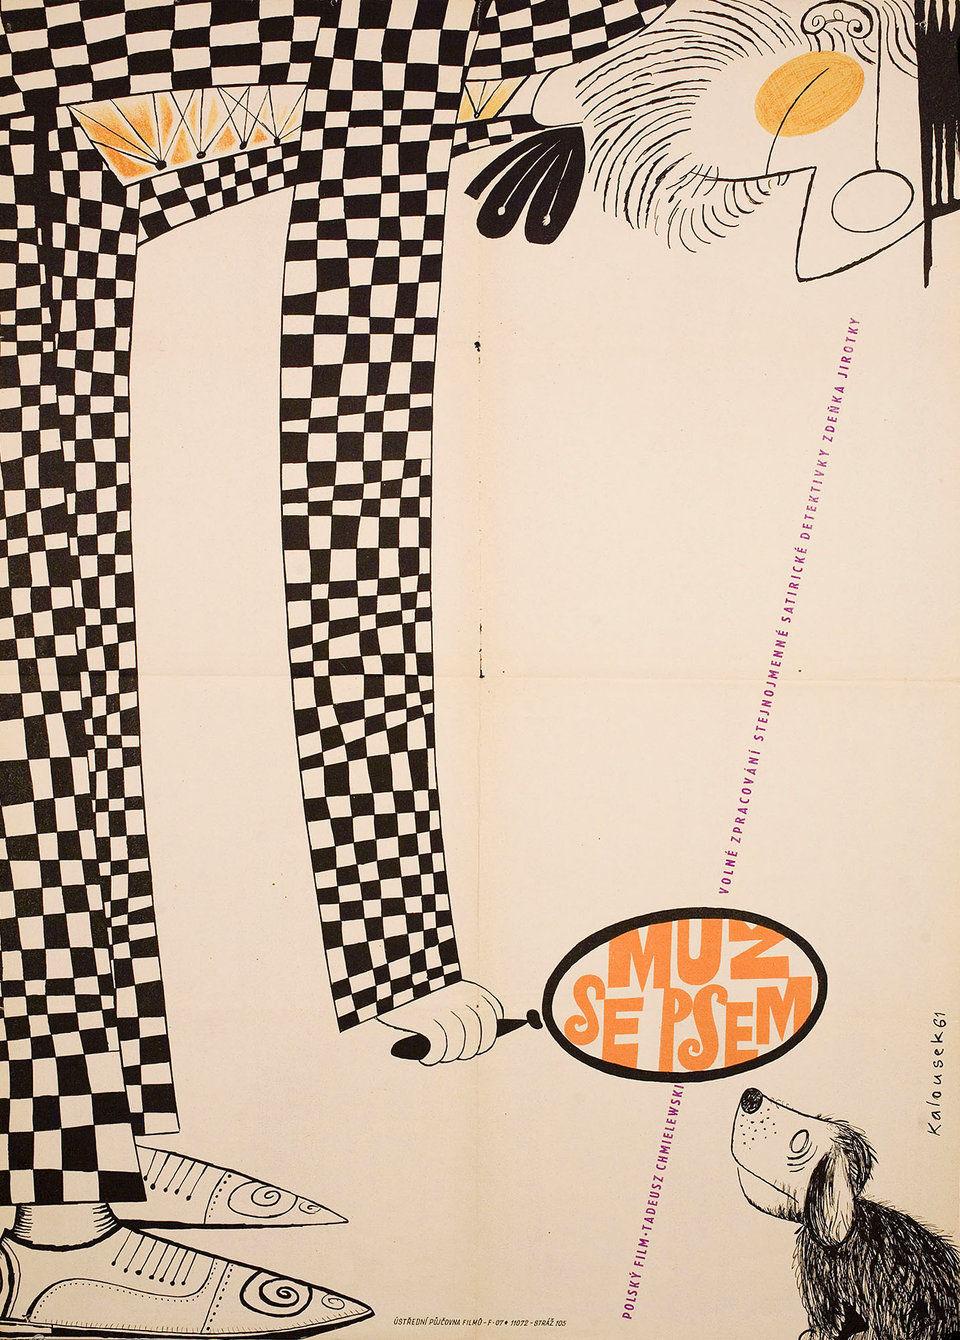 the-knave-of-spades-1961-original-czech-movie-poster